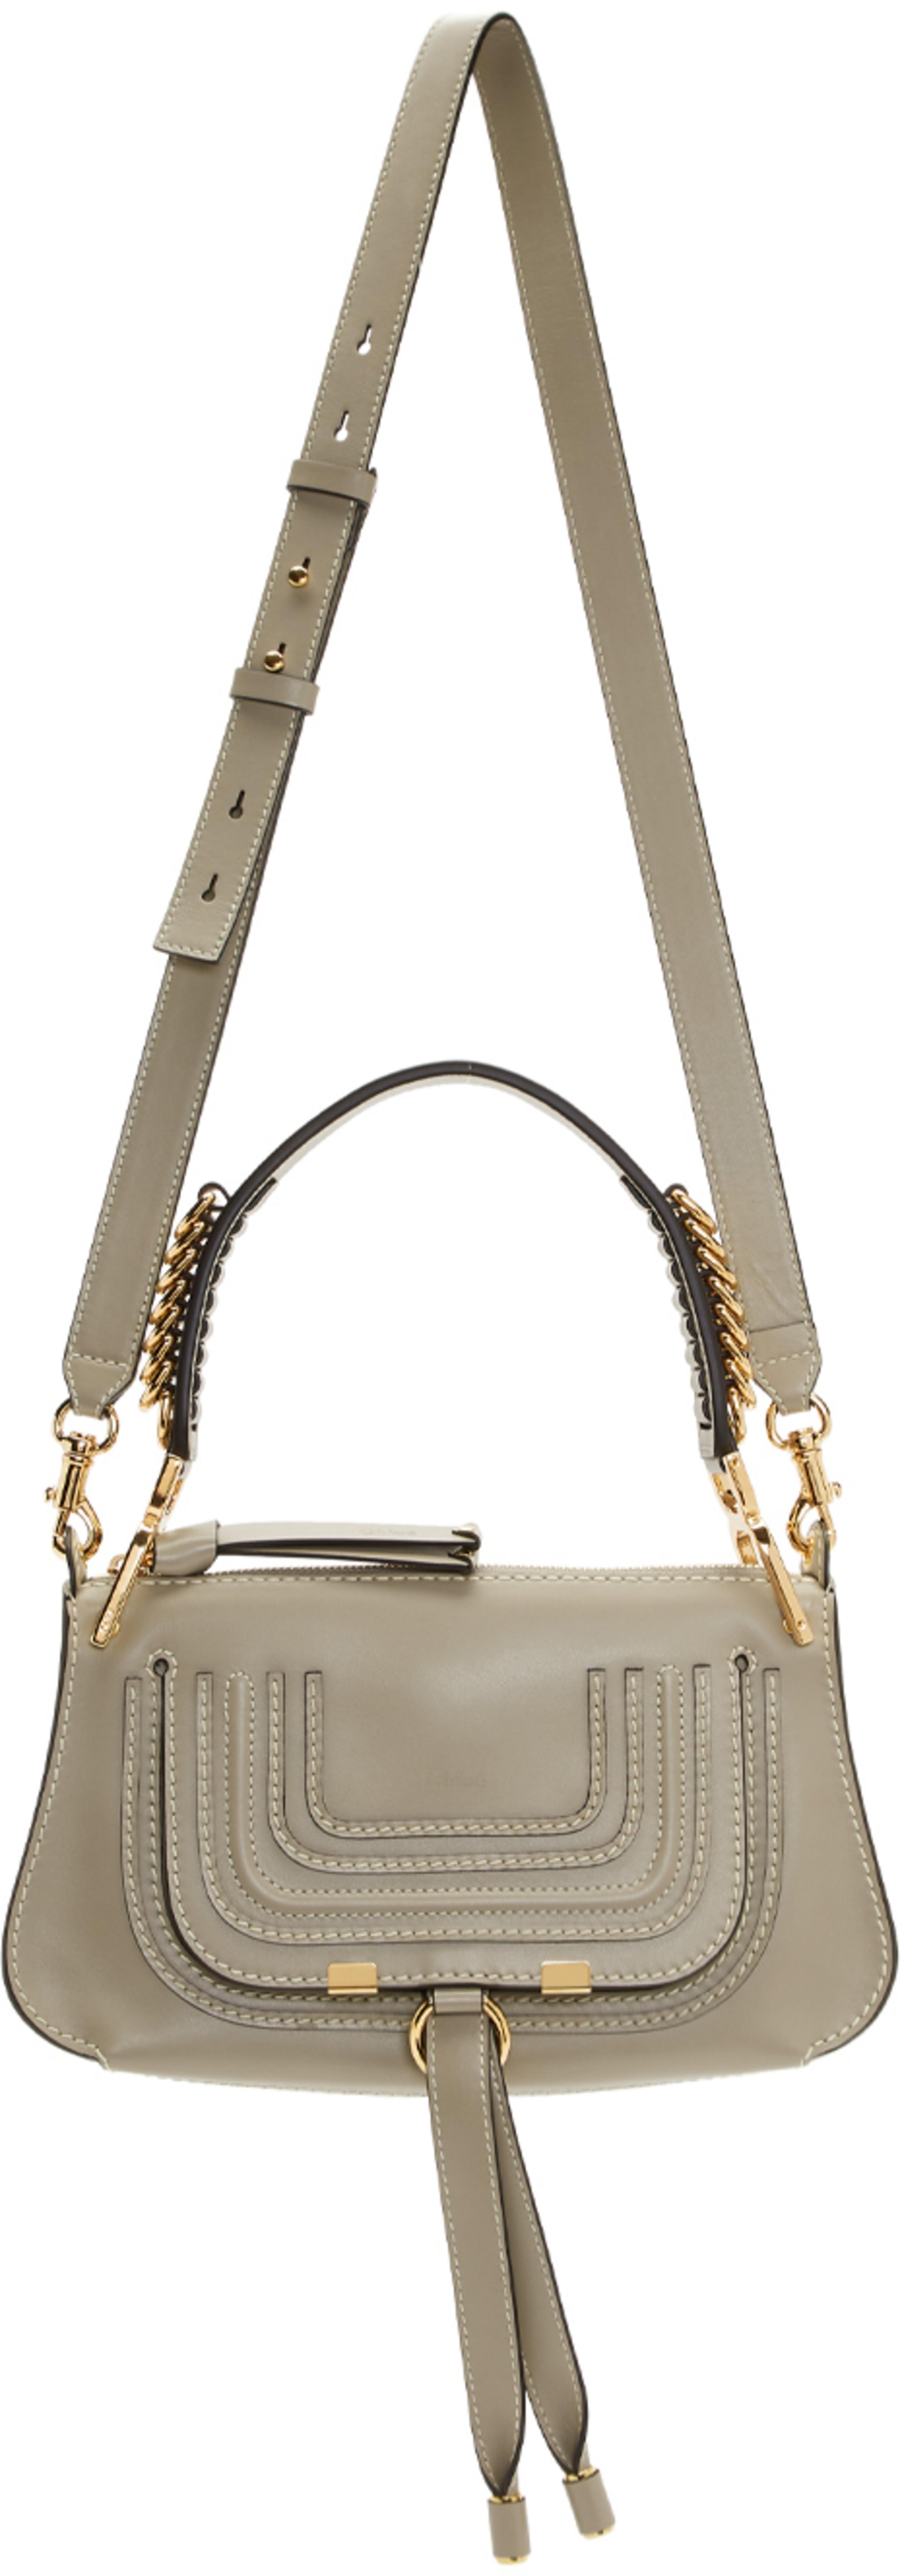 5377b0de68 Grey Marcie Saddle Bag